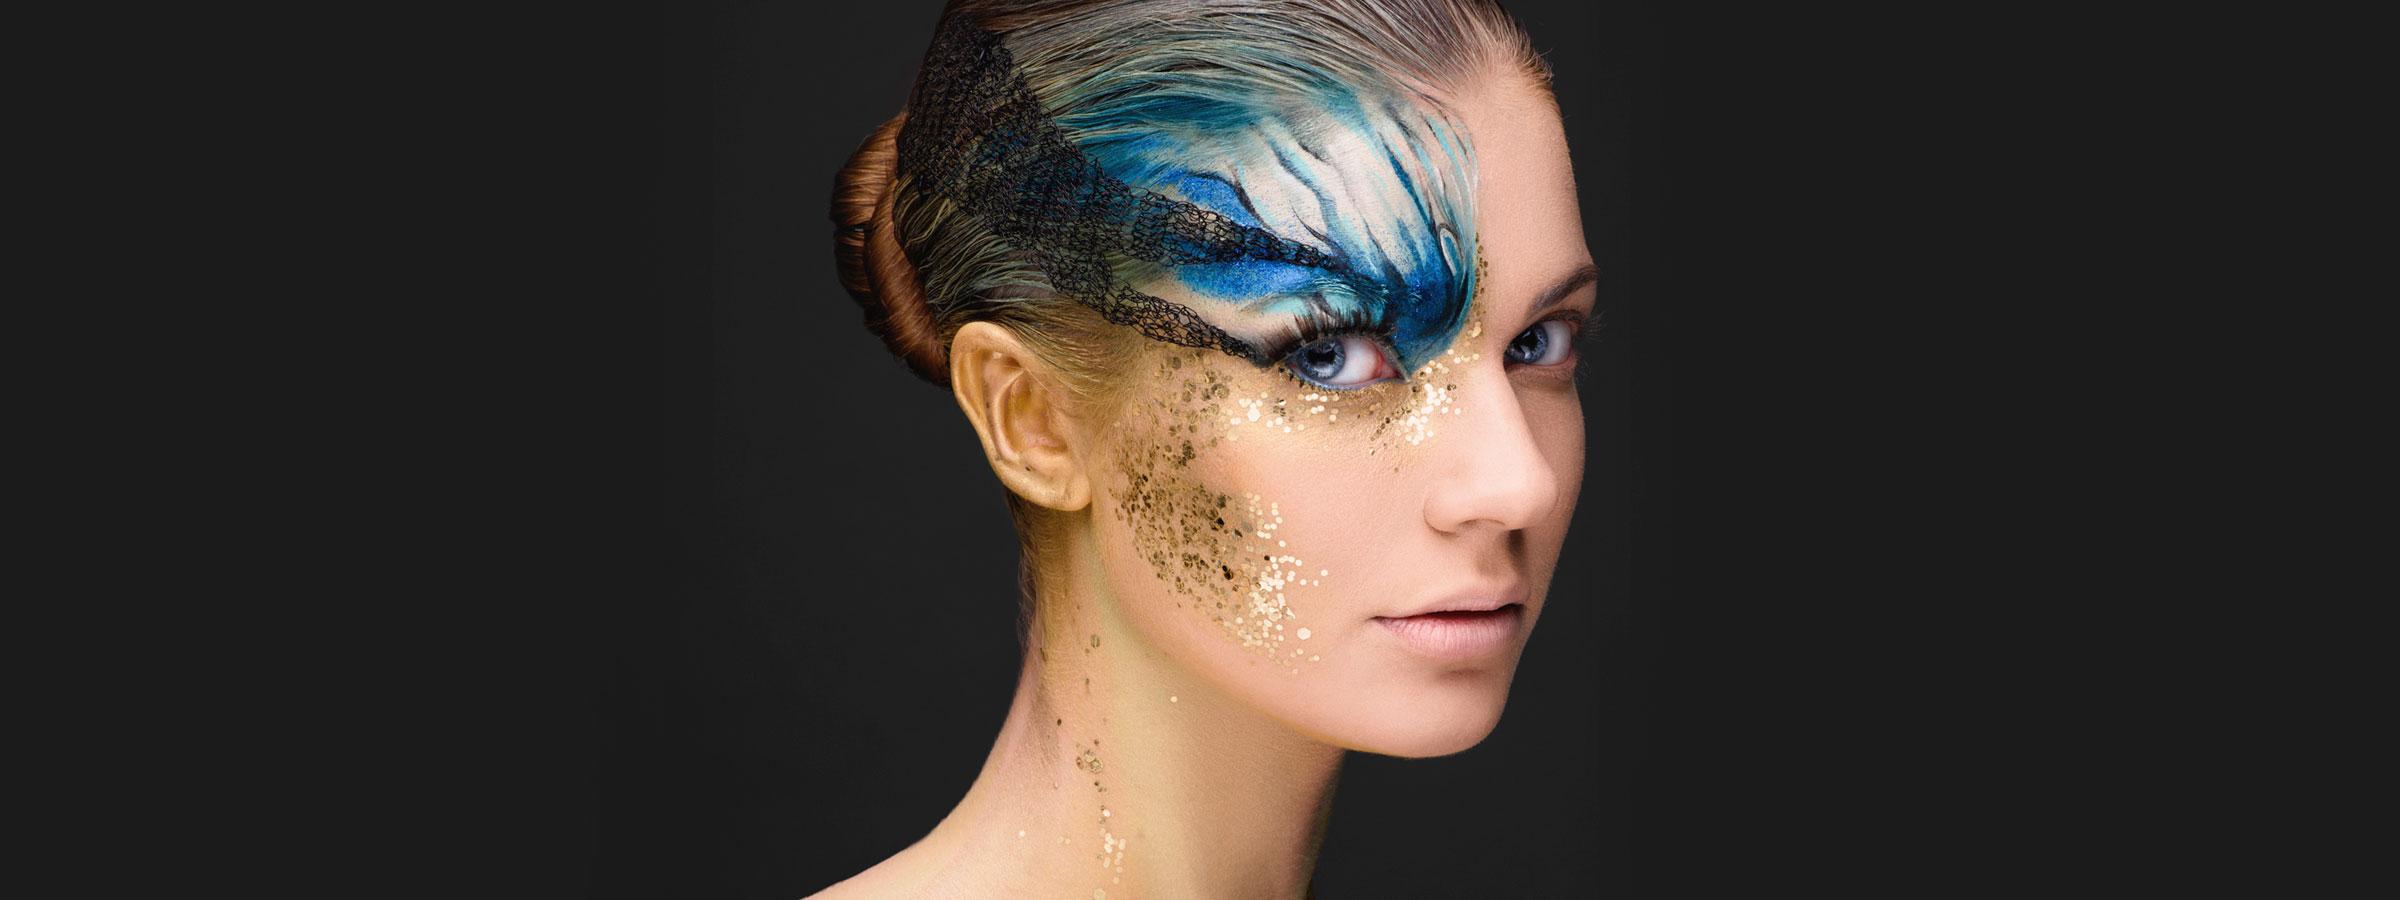 Maquillaje con Aerógrafo16 Horas